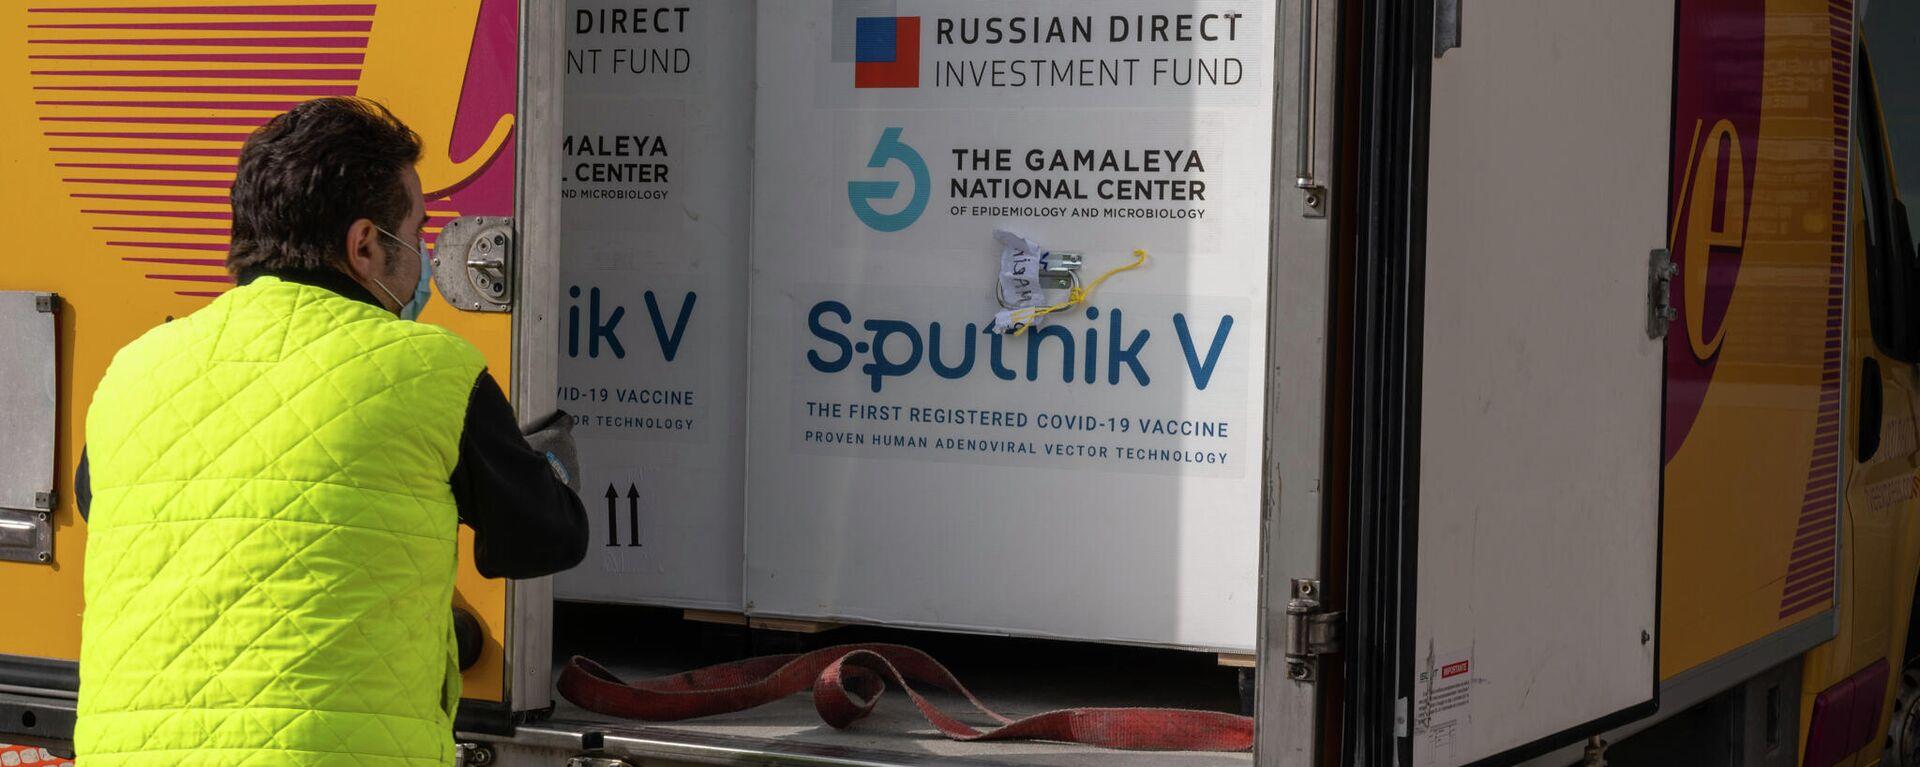 La vacuna Sputnik V en San Marino - Sputnik Mundo, 1920, 03.08.2021